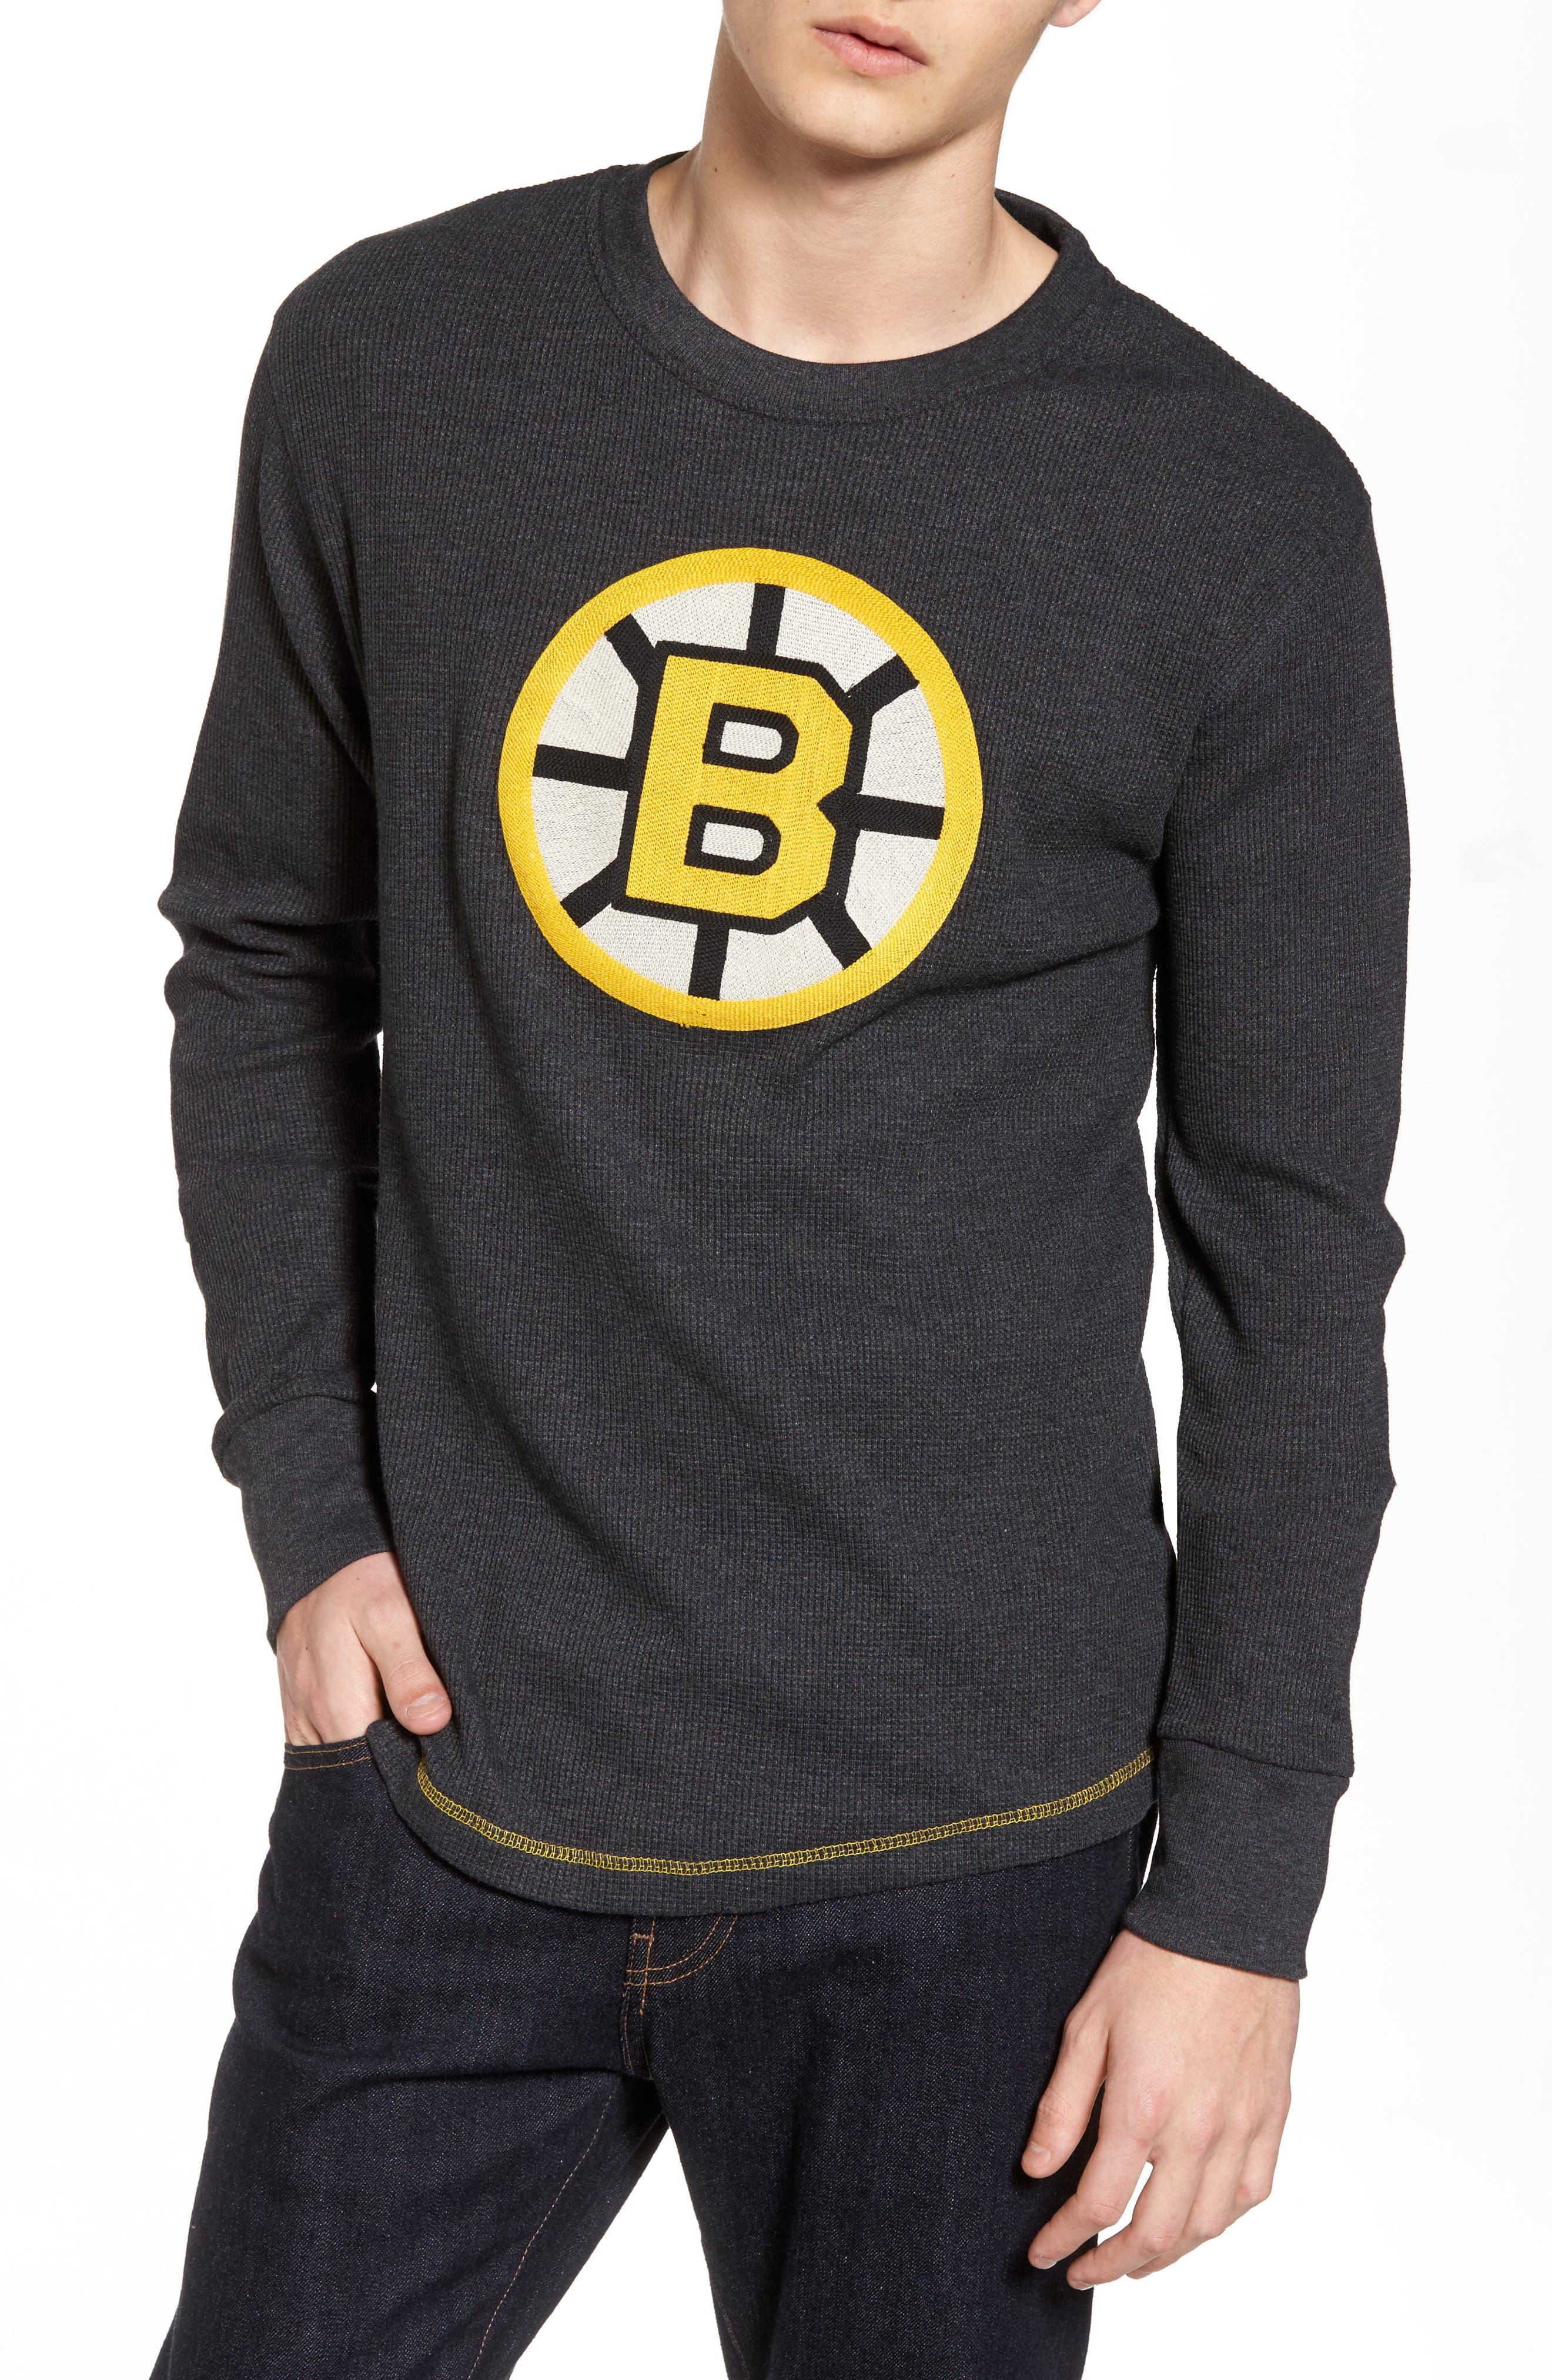 Boston Bruins Embroidered Long Sleeve Thermal Shirt,                         Main,                         color, Black